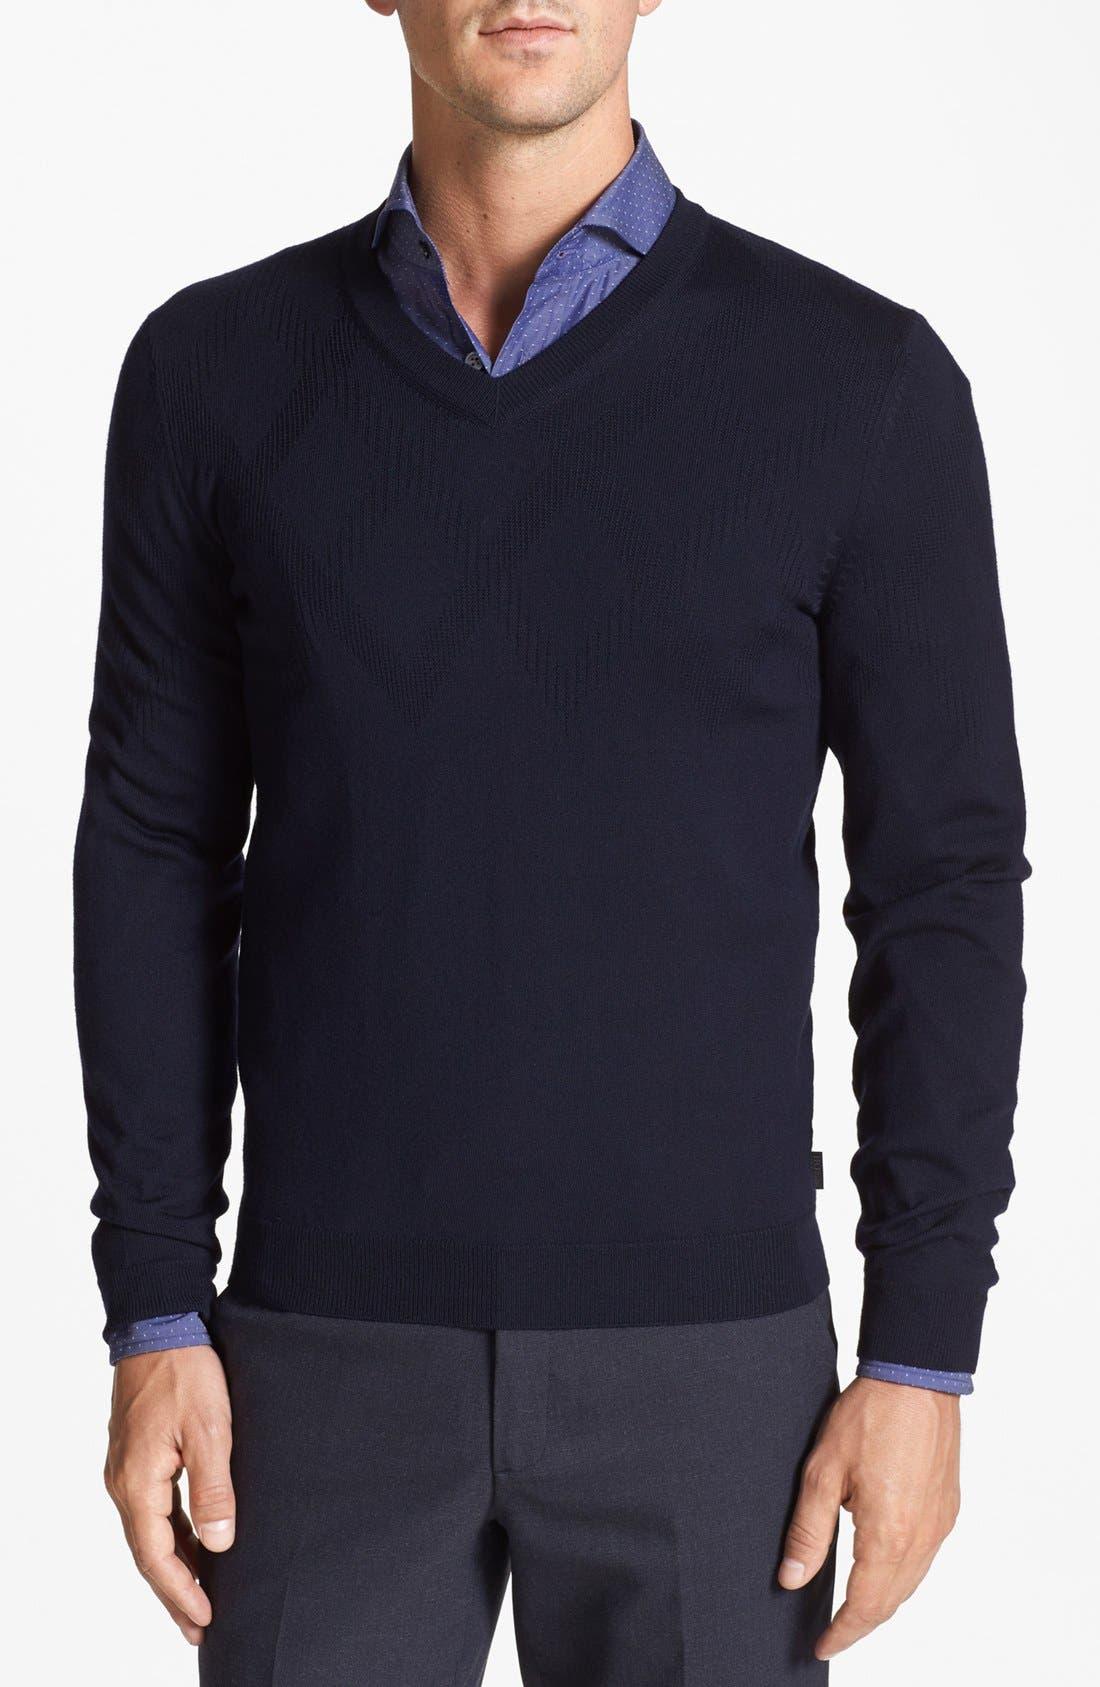 Alternate Image 1 Selected - BOSS HUGO BOSS 'Miles' Merino Wool Sweater